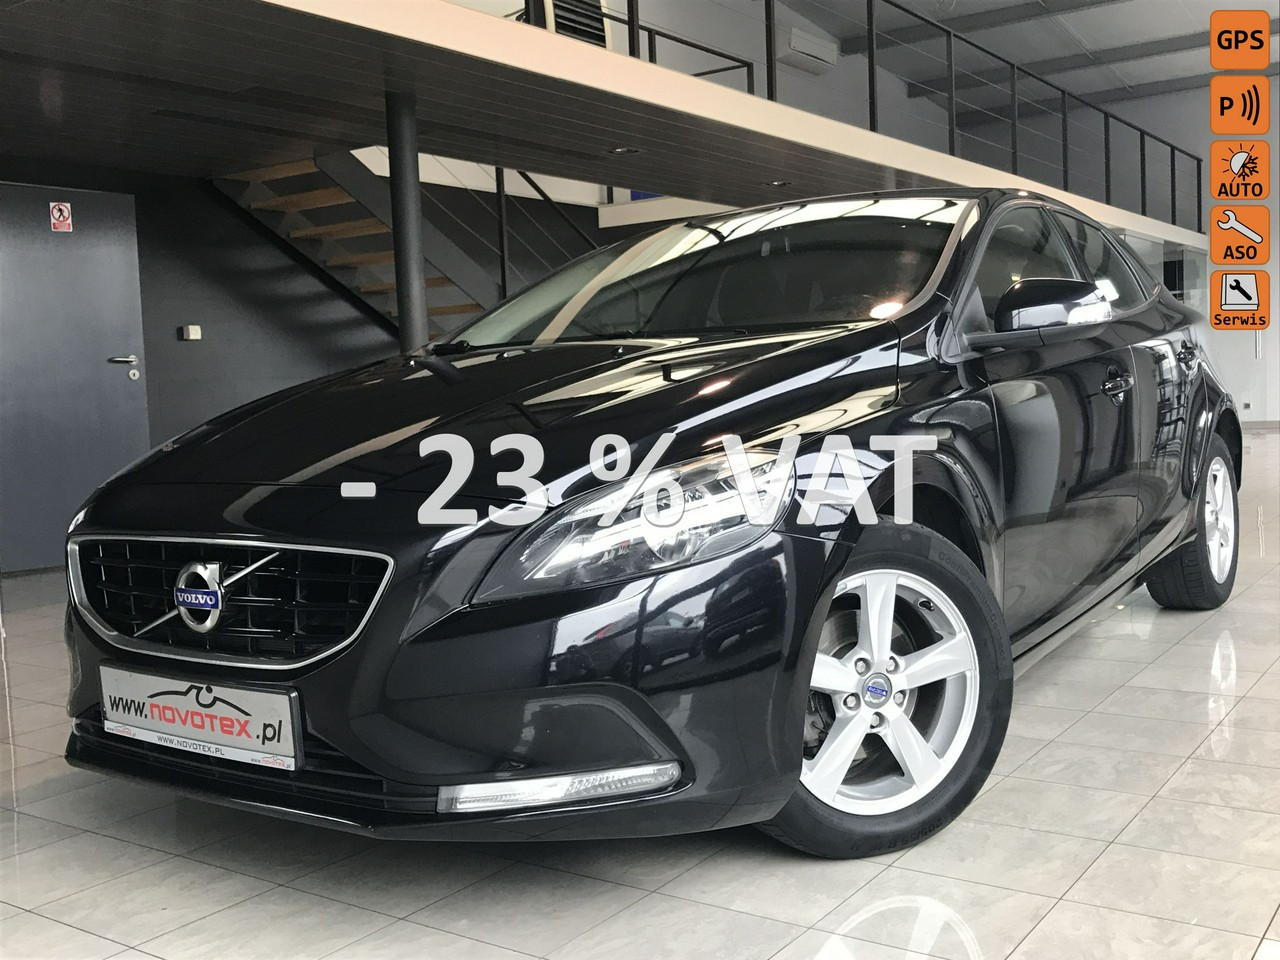 Volvo V40 D2*Momentum*navi*serwis w ASO*Gwarancja VIP Service